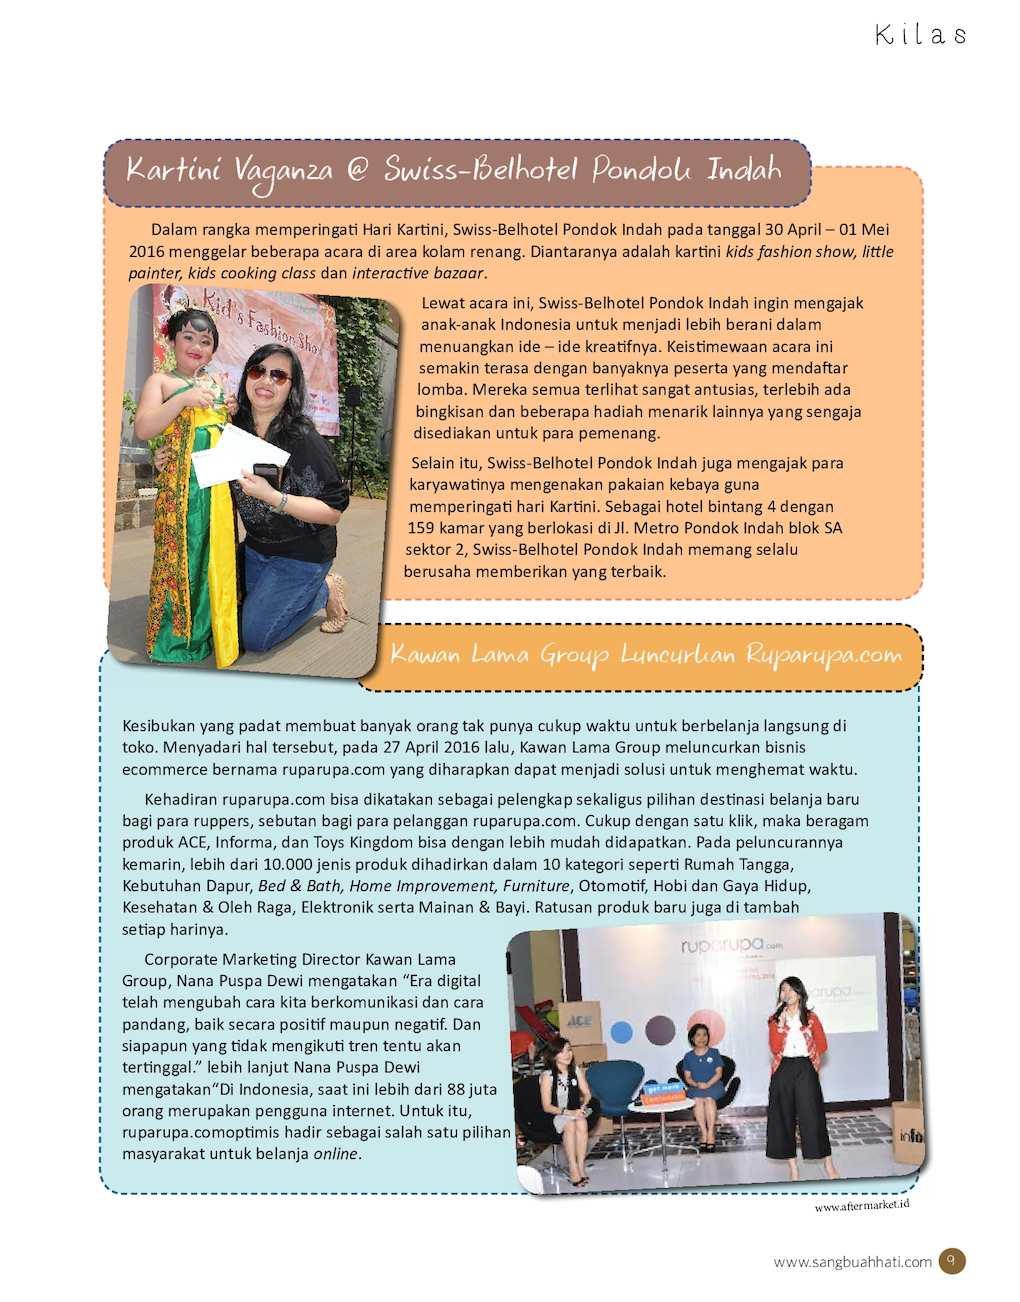 Info Harga Kuncup Magenta Kartini Kebaya Terbaru 2018 Tcash Vaganza 36 Totebag Ethnic Black Sbh Mei 2016 Calameo Downloader Page 11